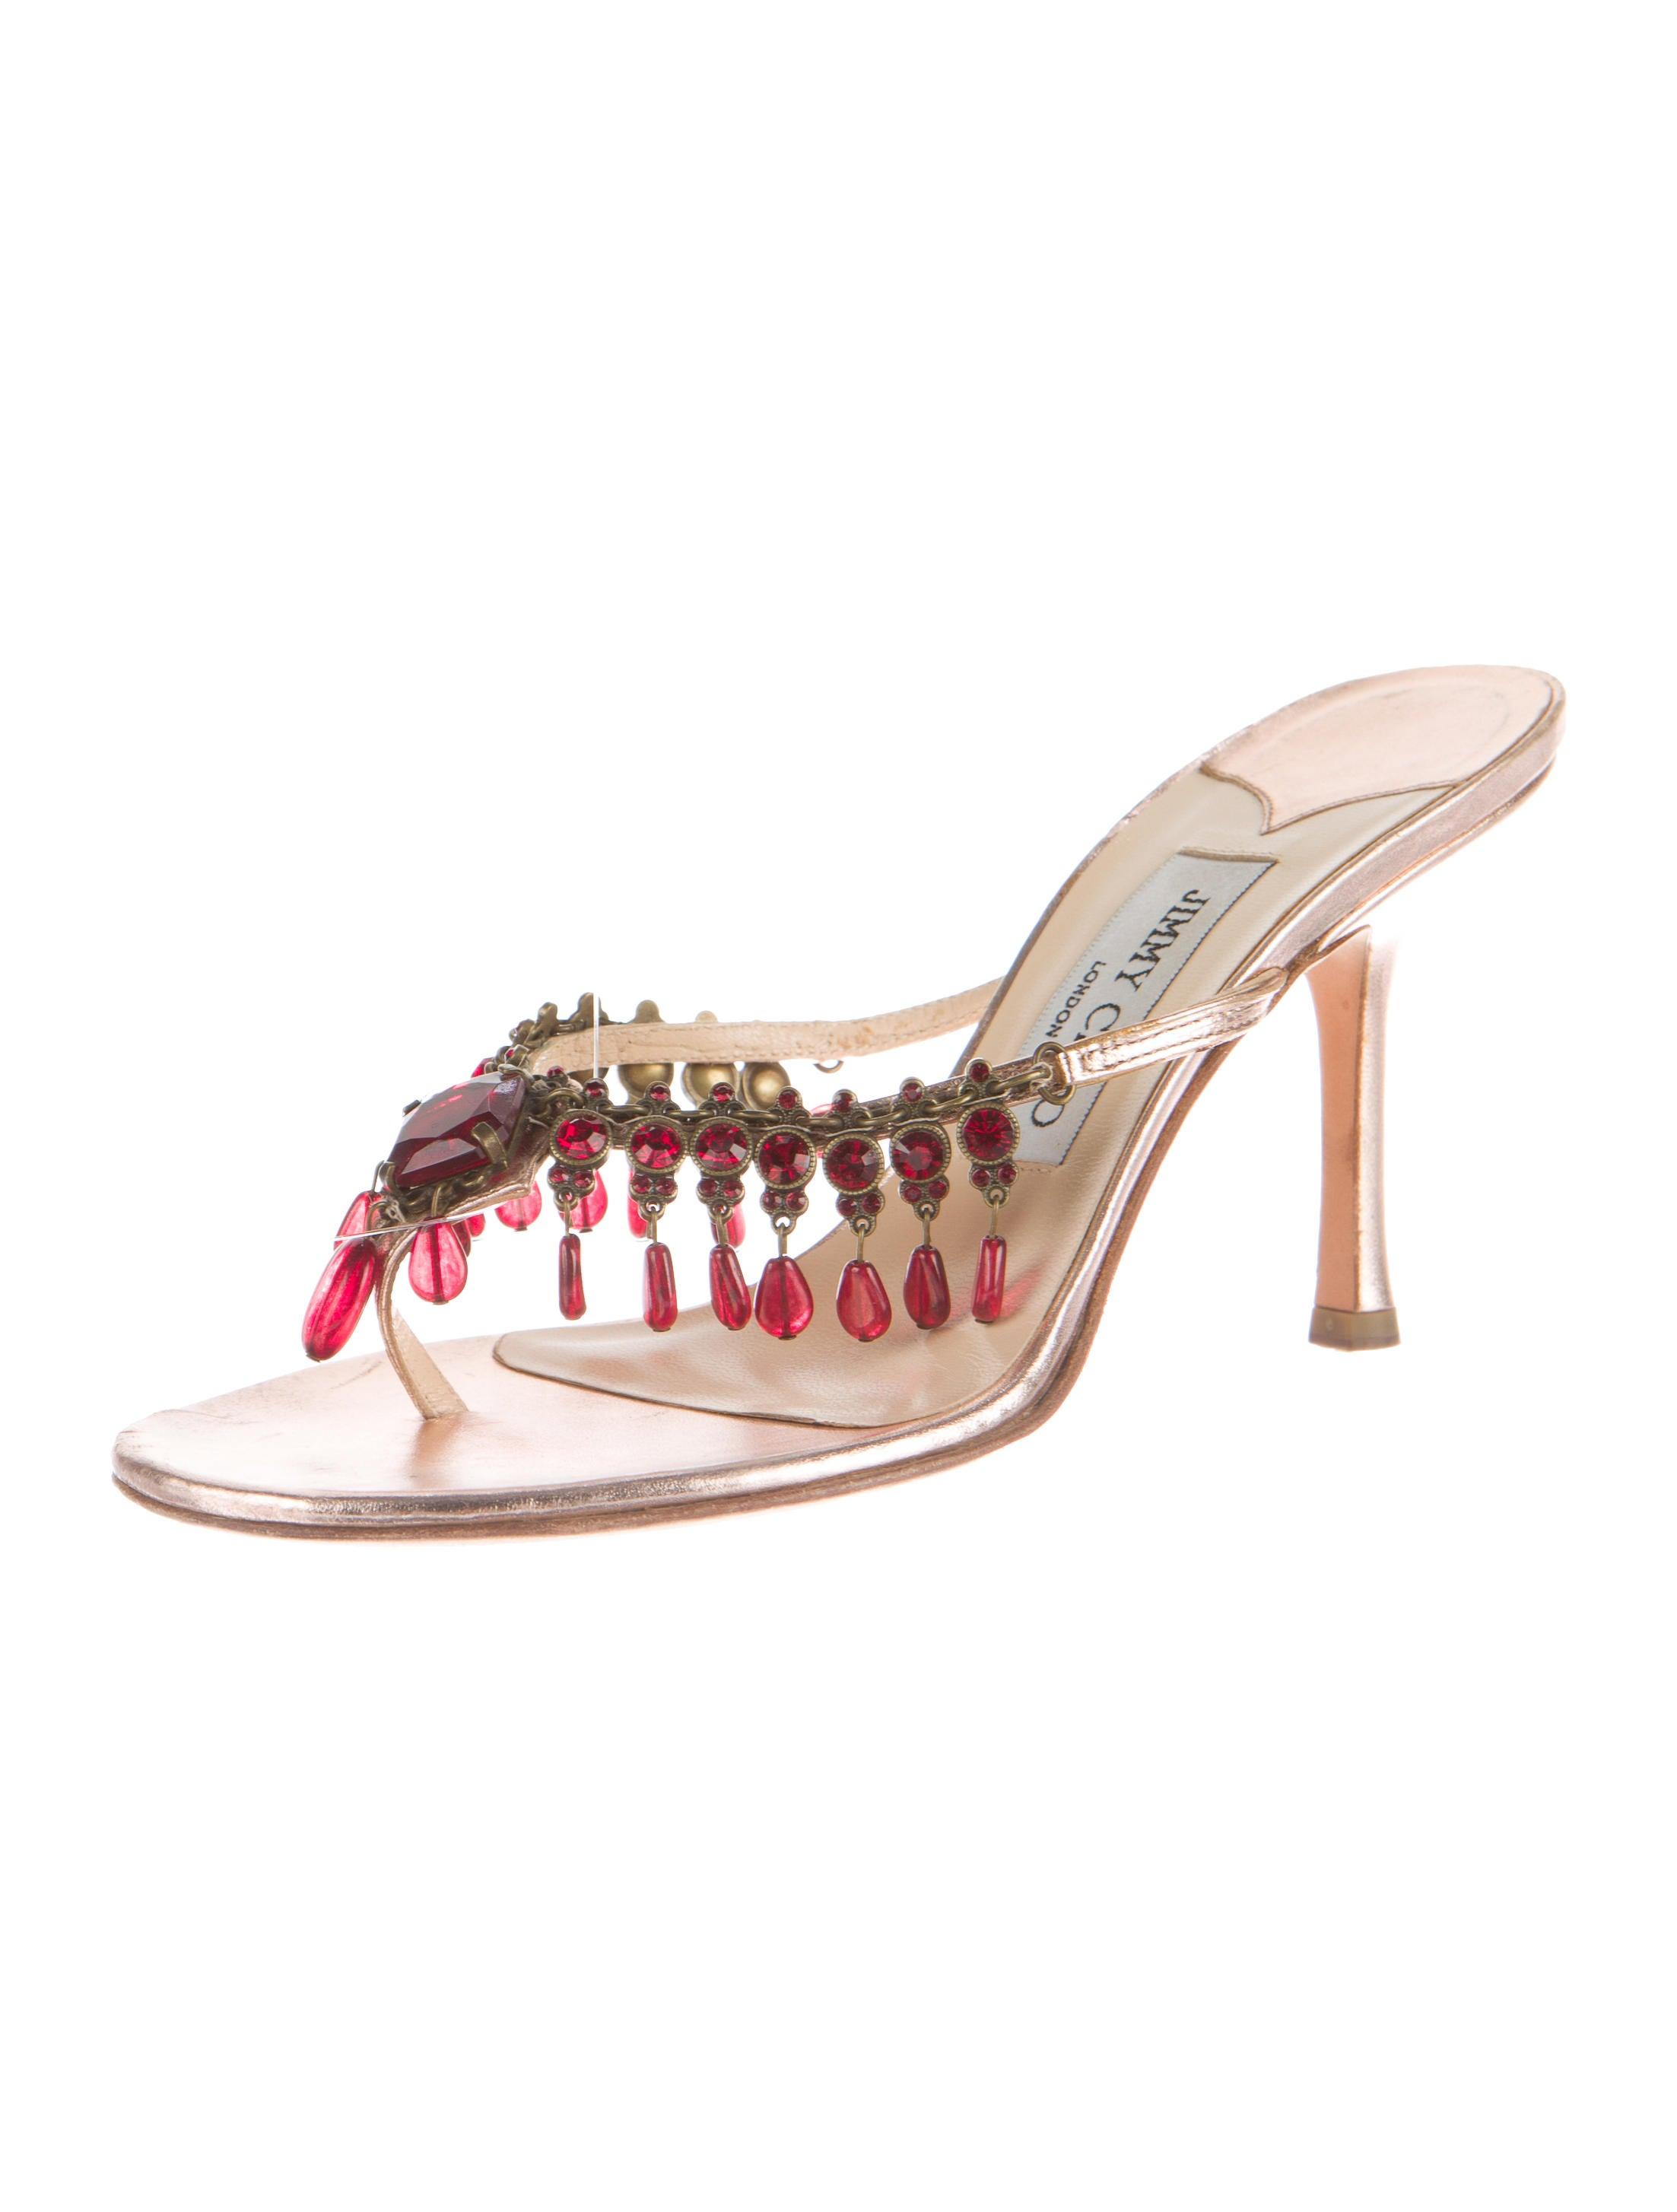 5aedb518434791 Jimmy Choo Embellished Slide Sandals - Shoes - JIM58400